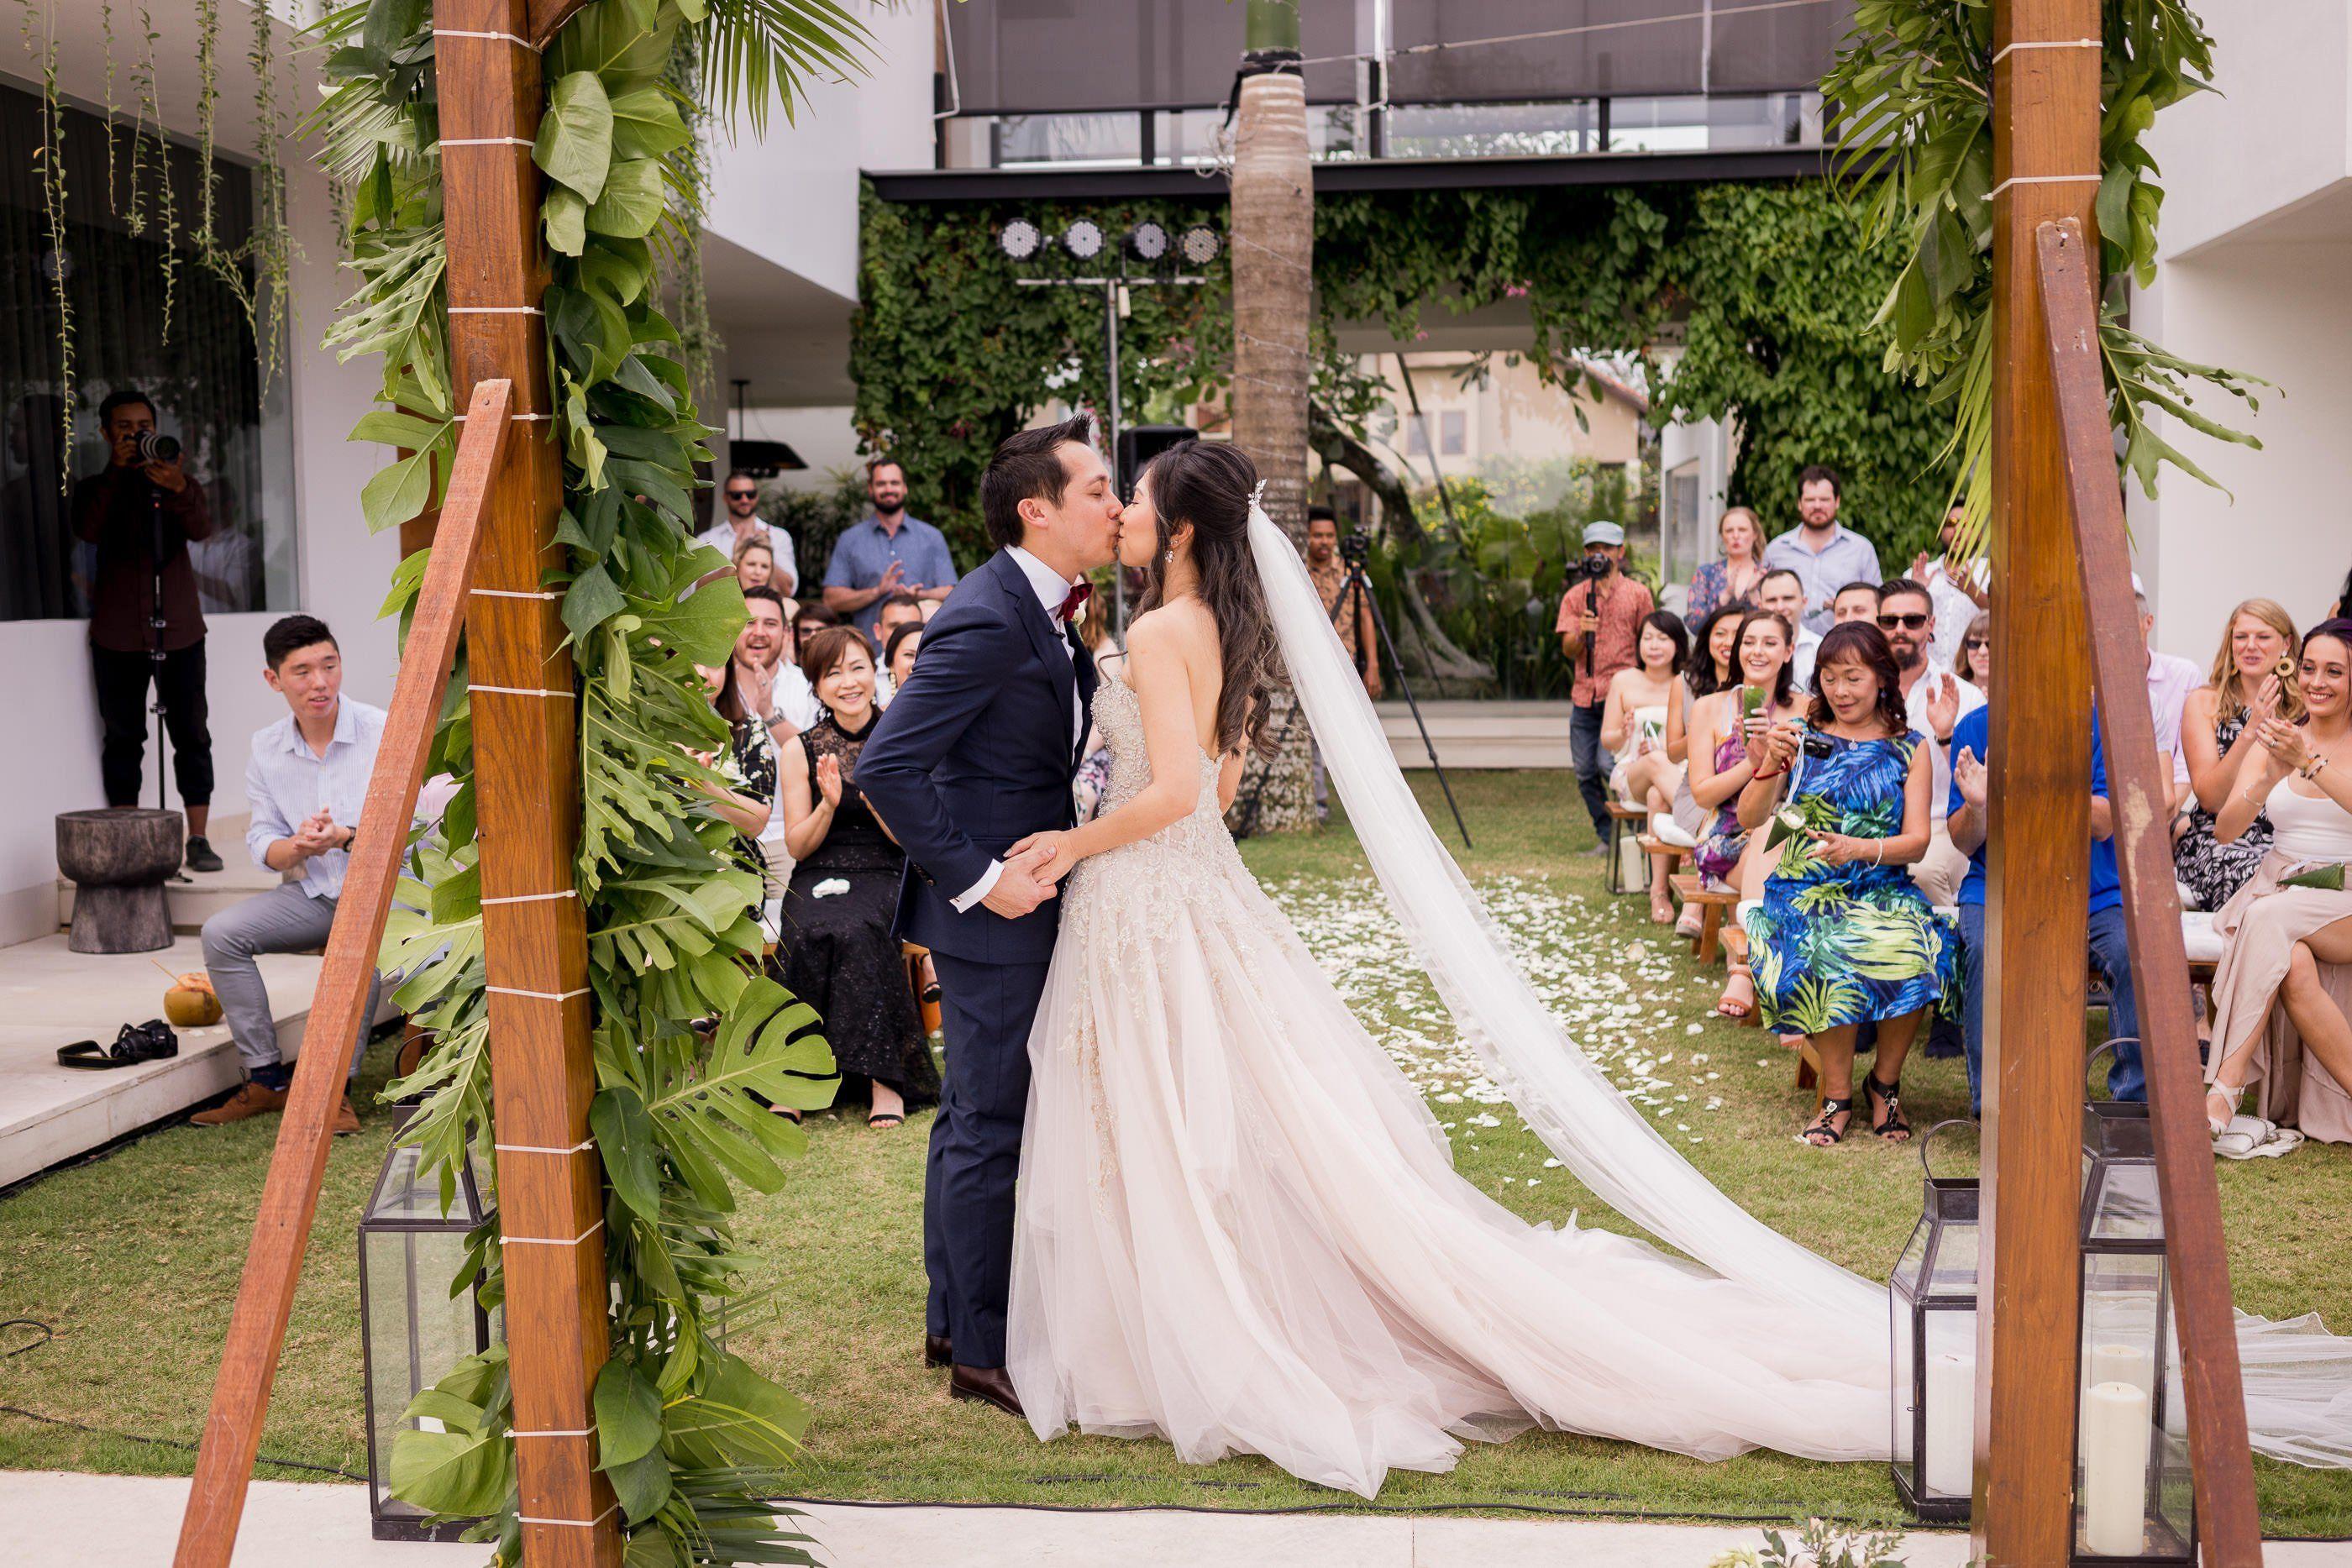 destination wedding ceremony ideas